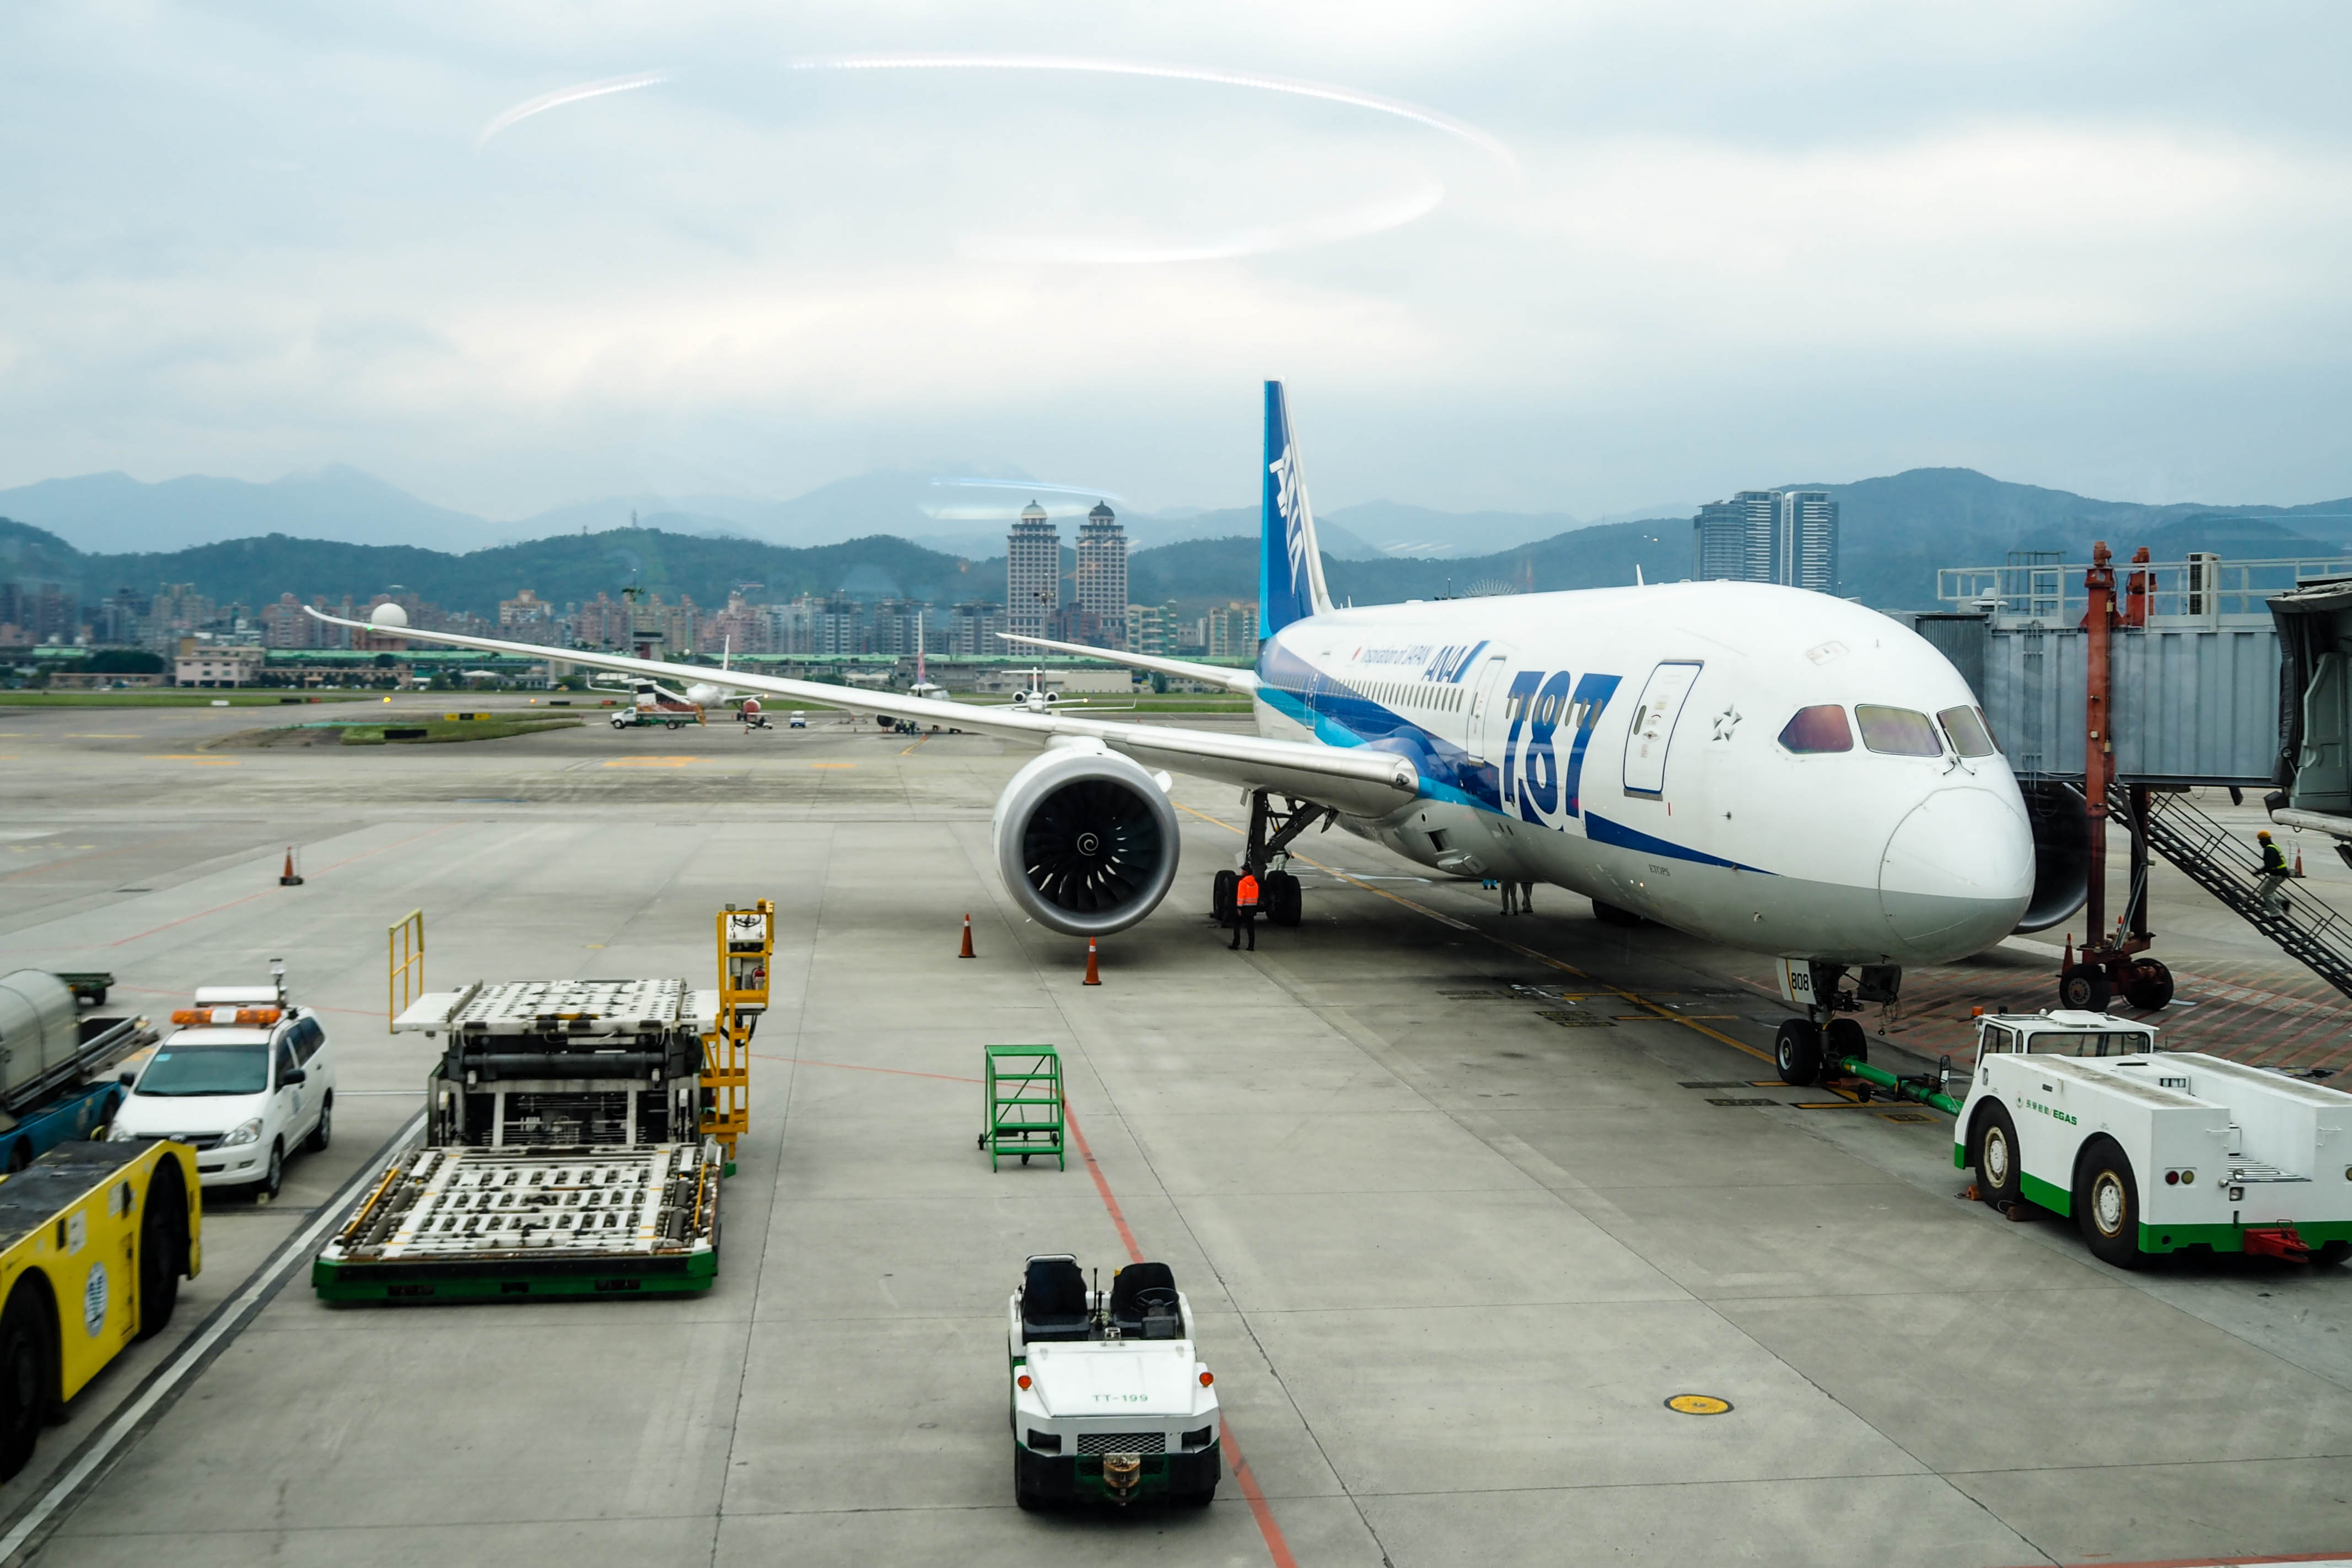 ANA夢幻客機787 商務艙松山